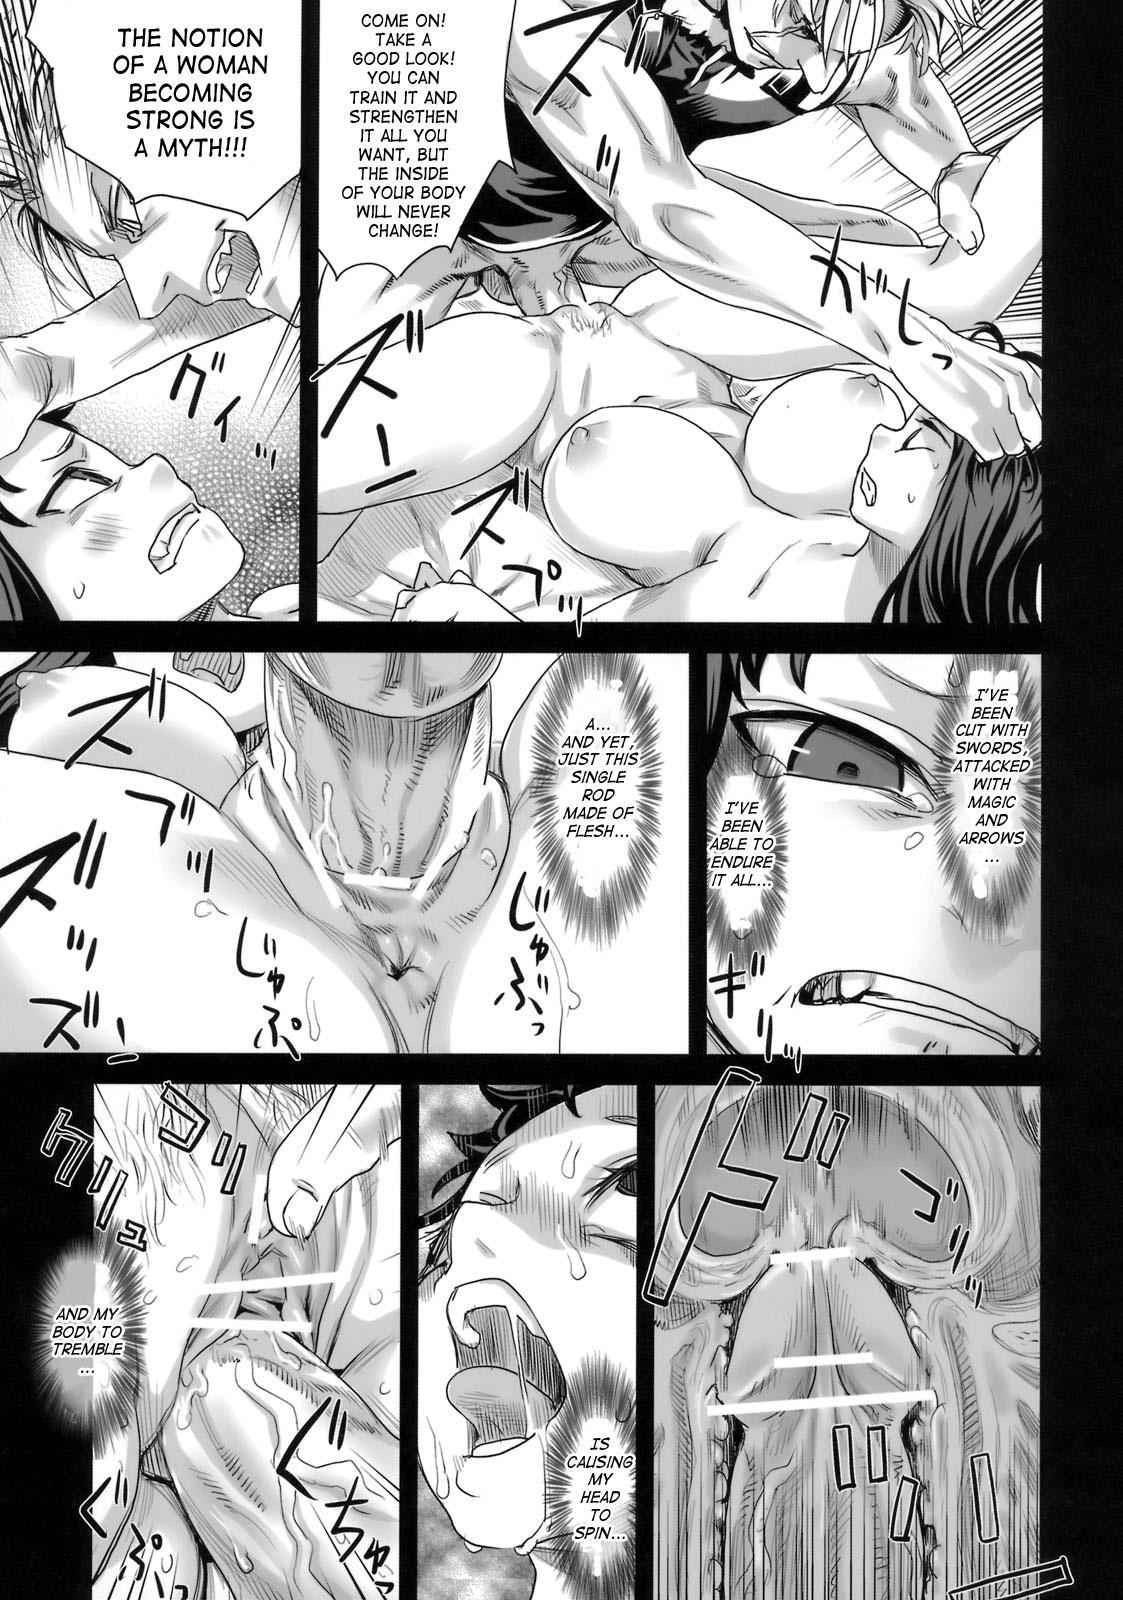 (C76) [Fatalpulse (Asanagi)] Victim Girls 7 - Jaku Niku Kyoushoku Dog-eat-Bitch (Fantasy Earth Zero) [English] [SaHa] 17